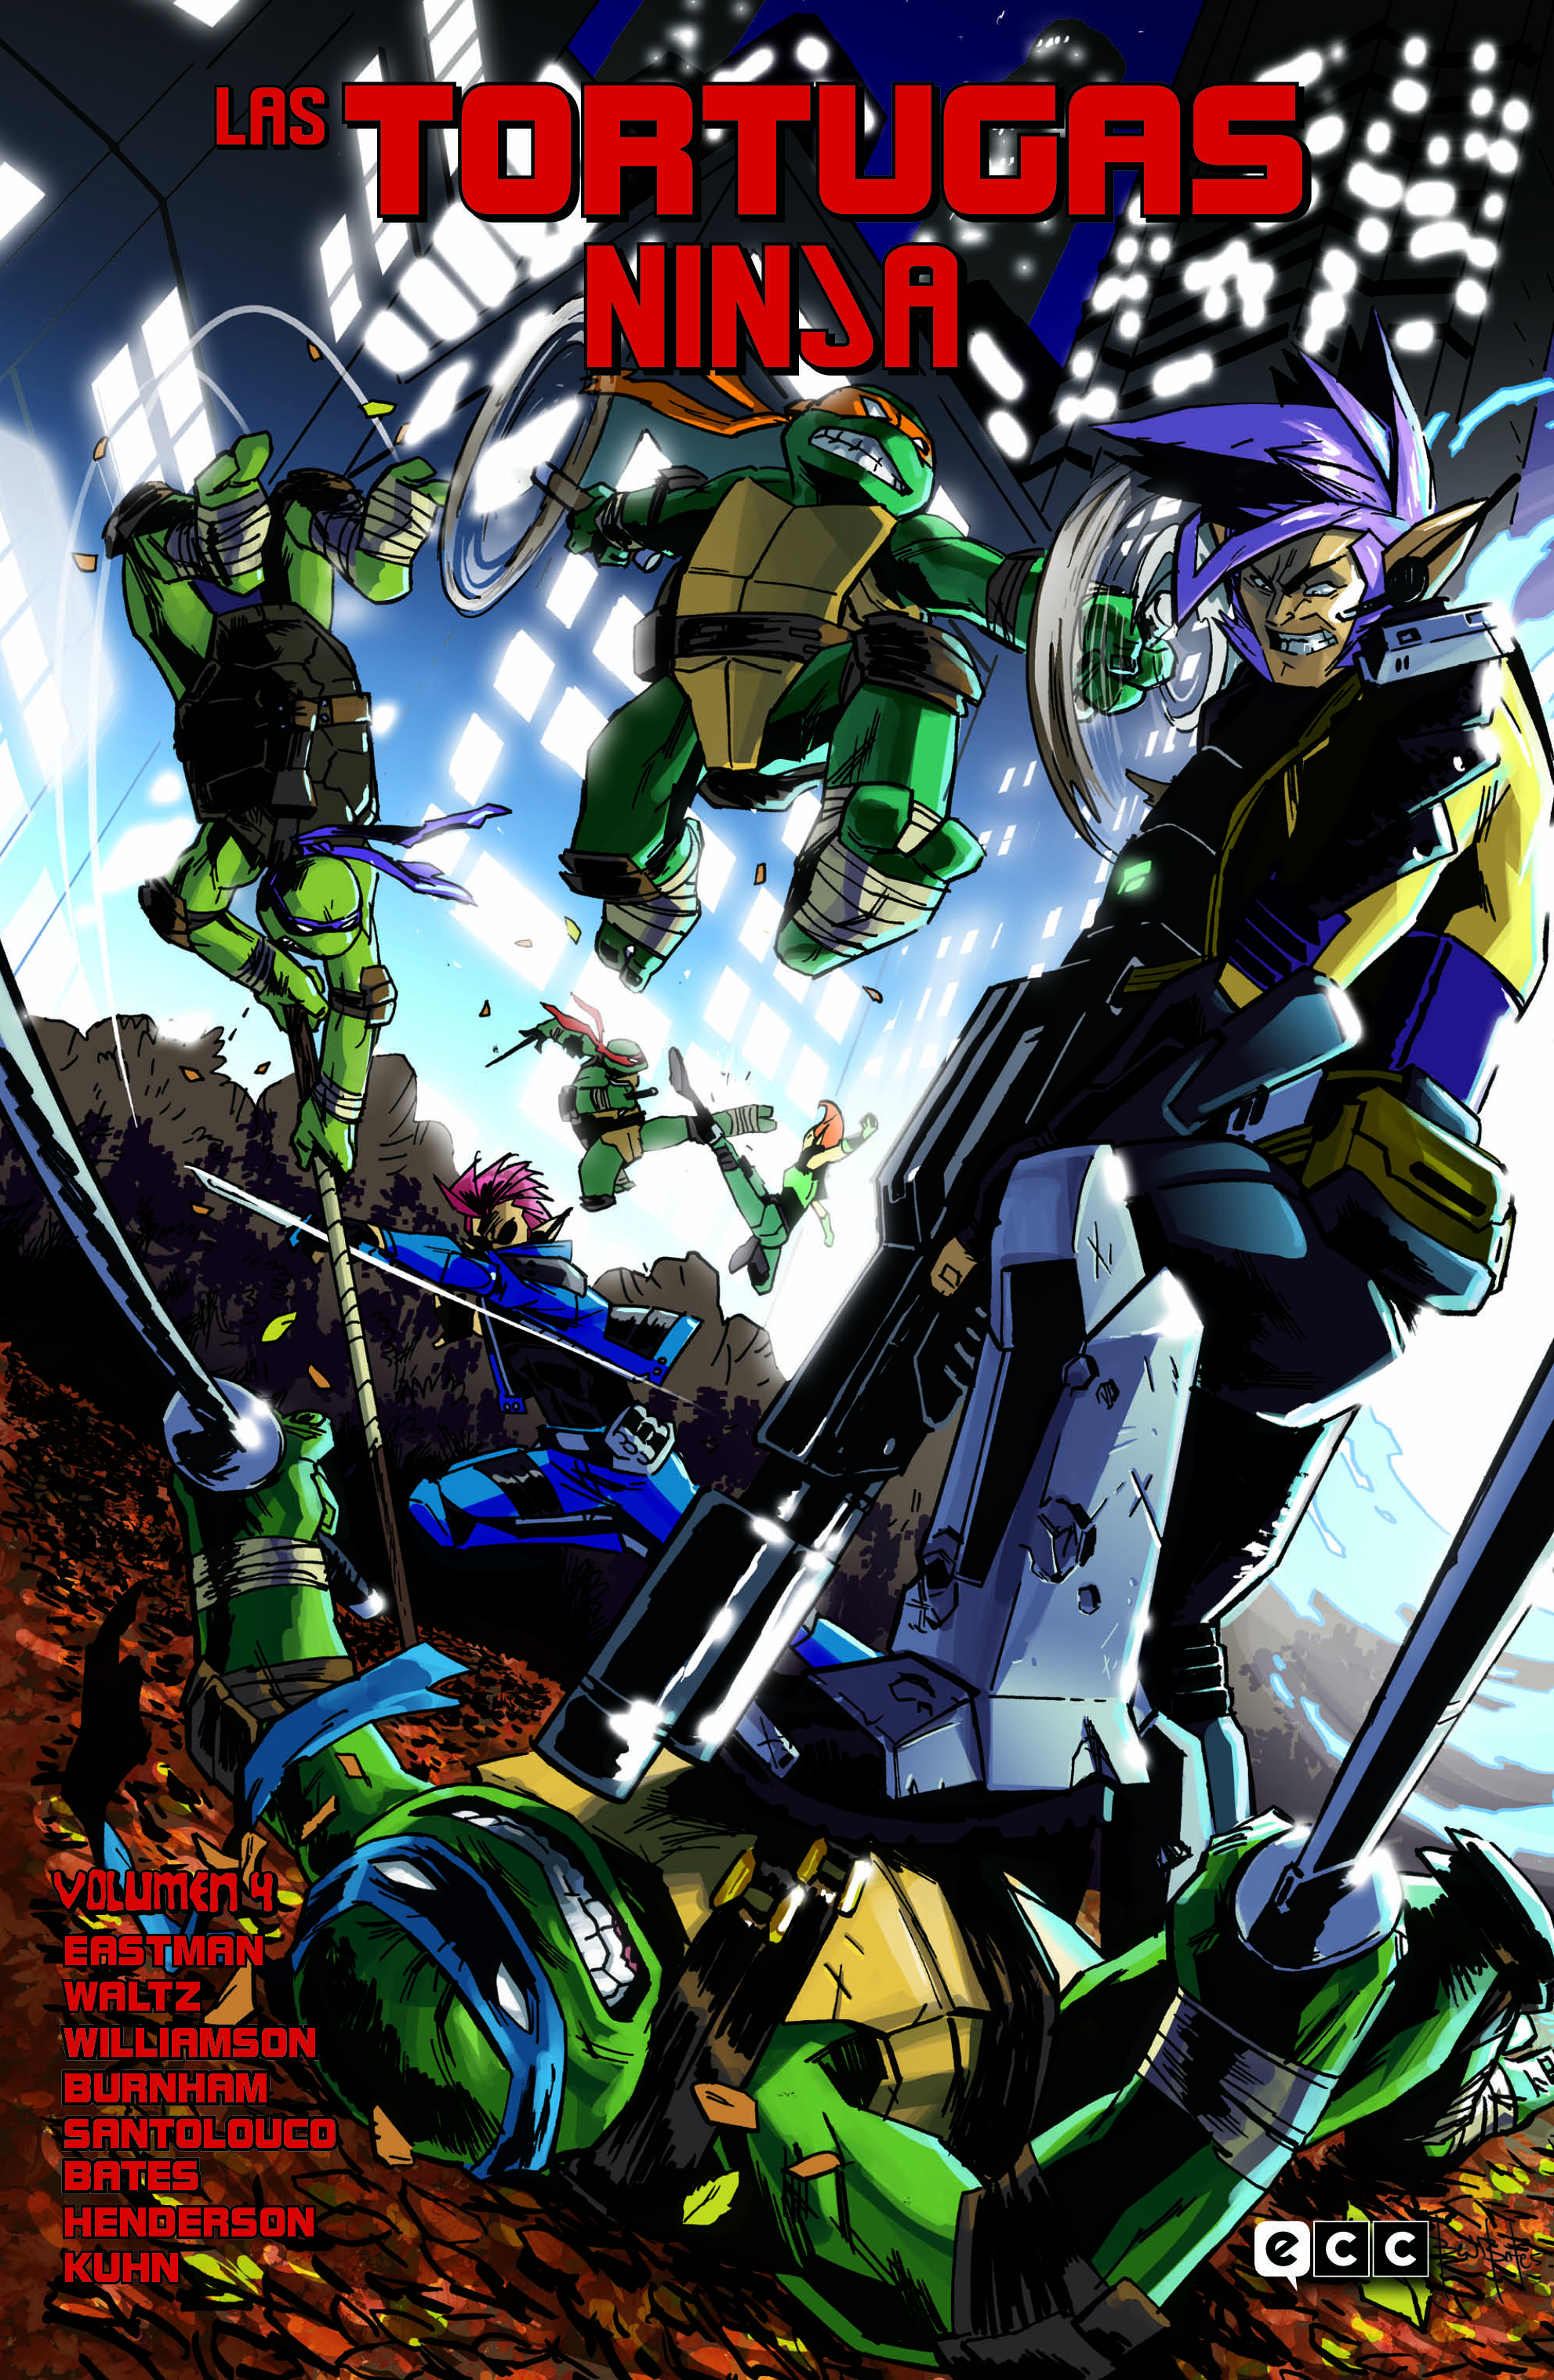 Las Tortugas Ninja vol. 04